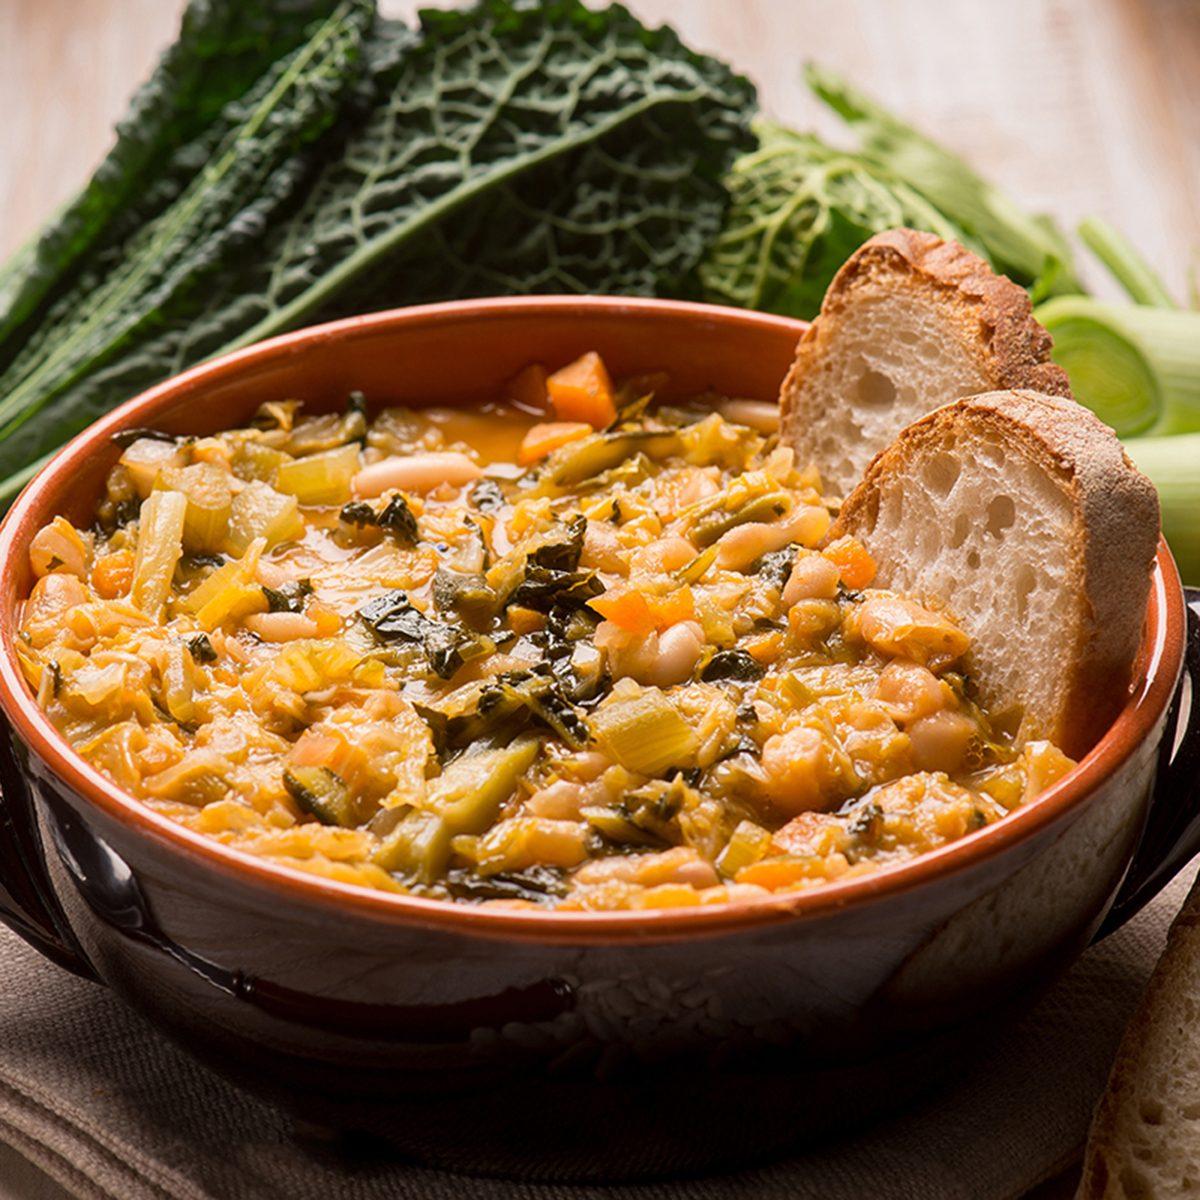 ribollita traditional tuscany soup, selective focus; Shutterstock ID 674730508; Job (TFH, TOH, RD, BNB, CWM, CM): TOH